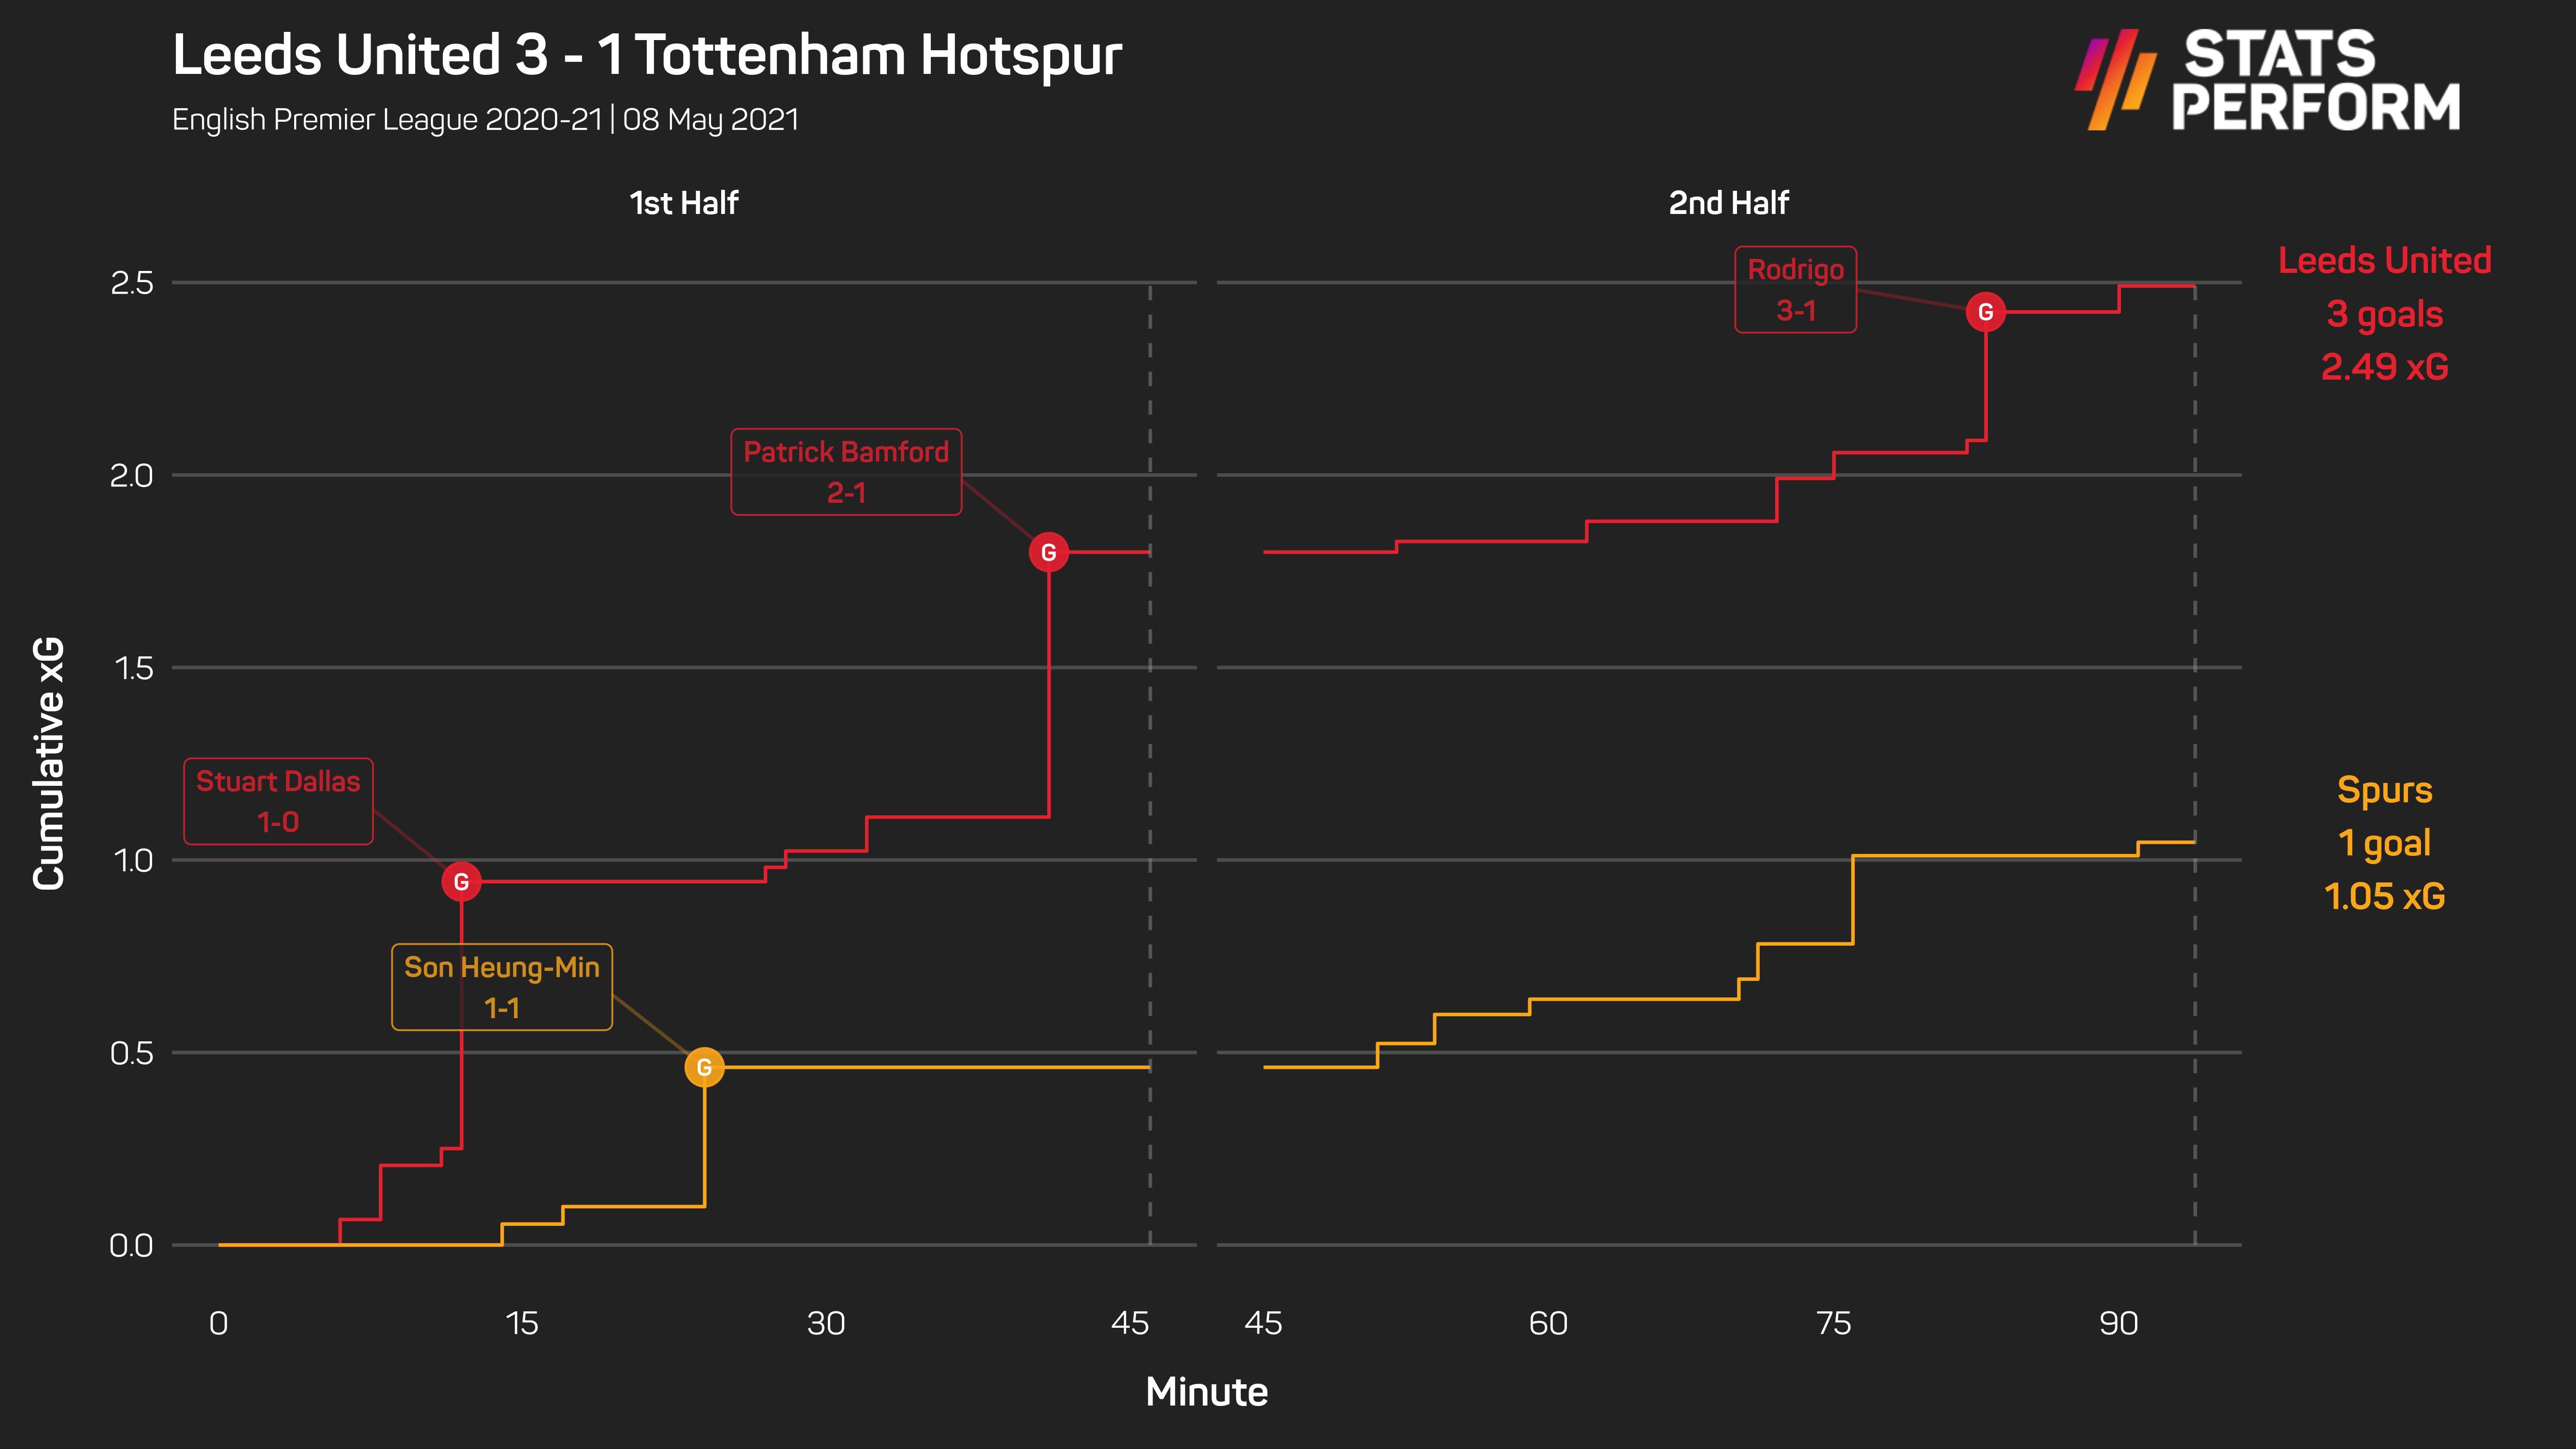 Leeds 3-1 Tottenham